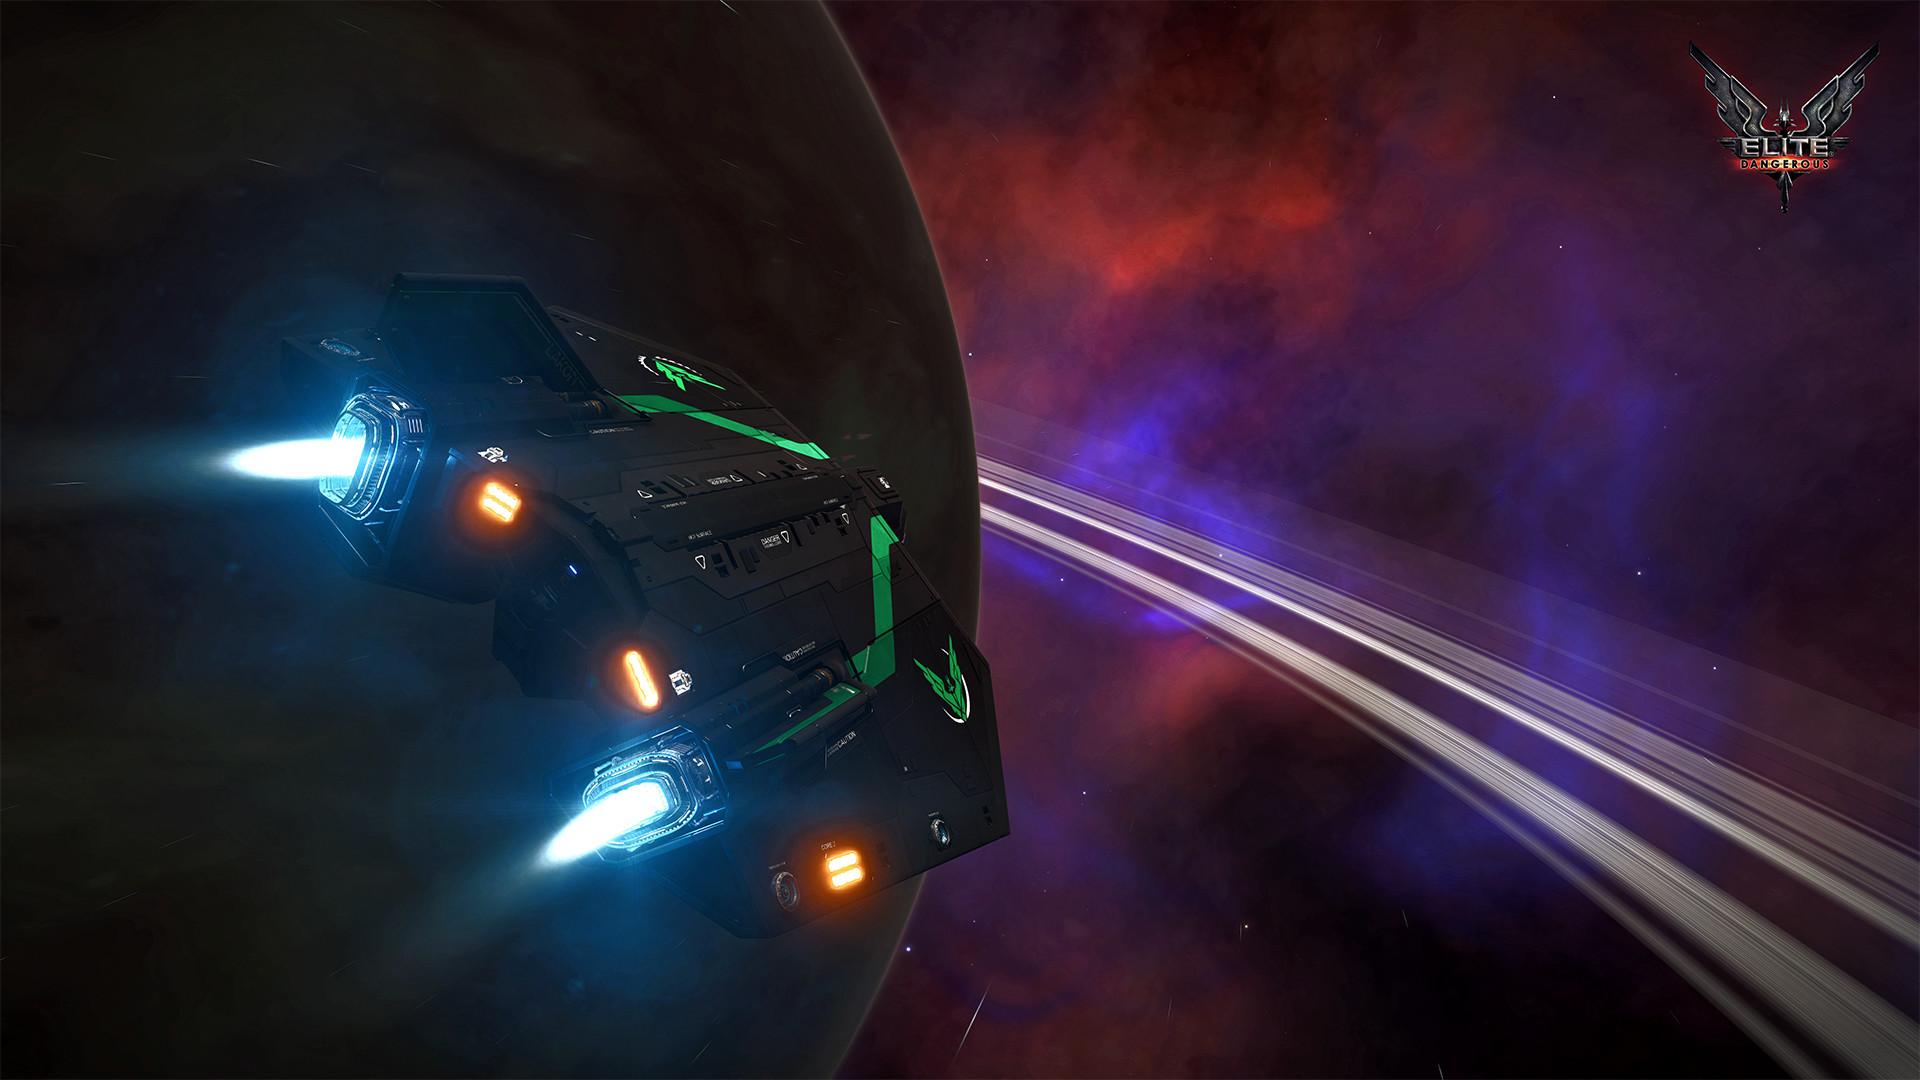 … Elite Dangerous GasGiant Nebula Wallpaper 4k 1080p by Jarminx